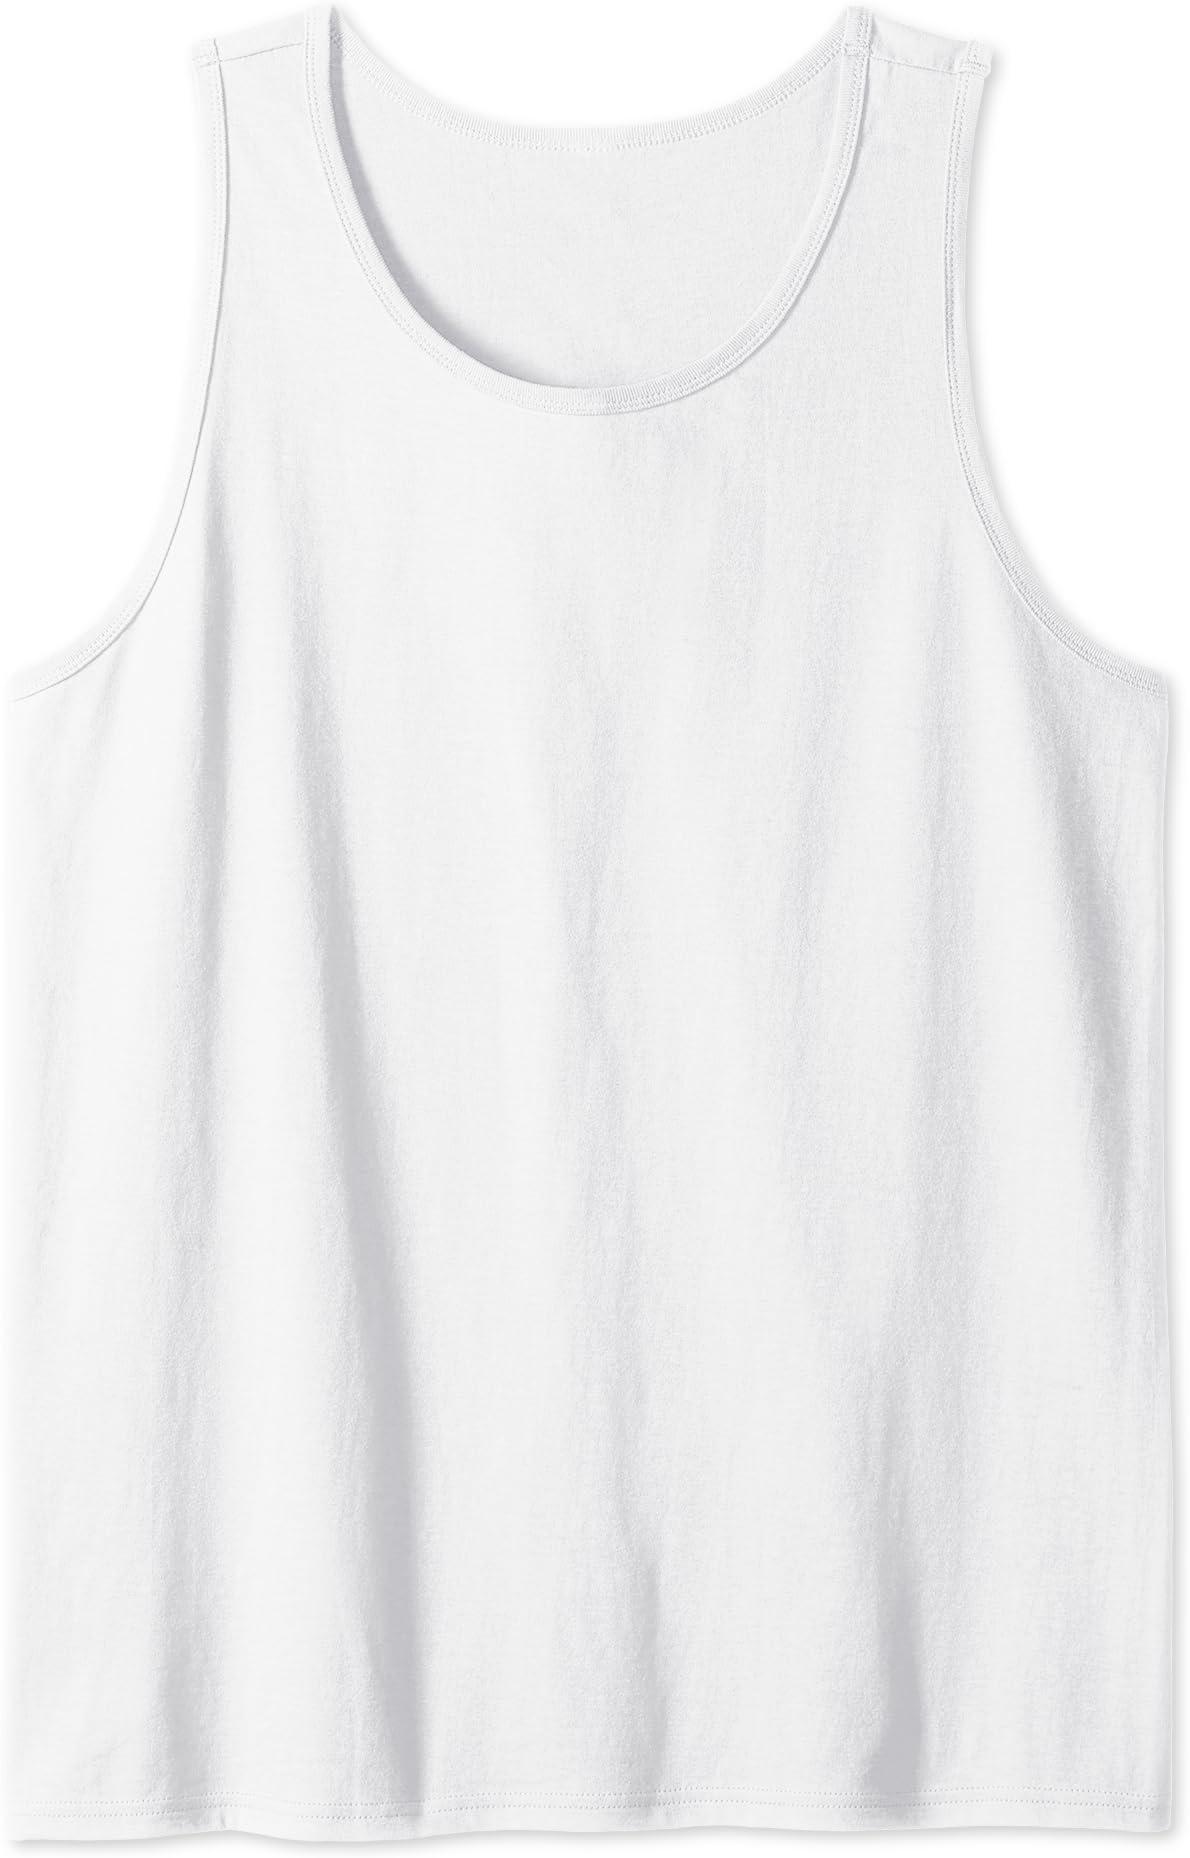 I Just Hope Both Teams Have Fun Tanks Top Sleeveless Shirt Fit Mens Muscle